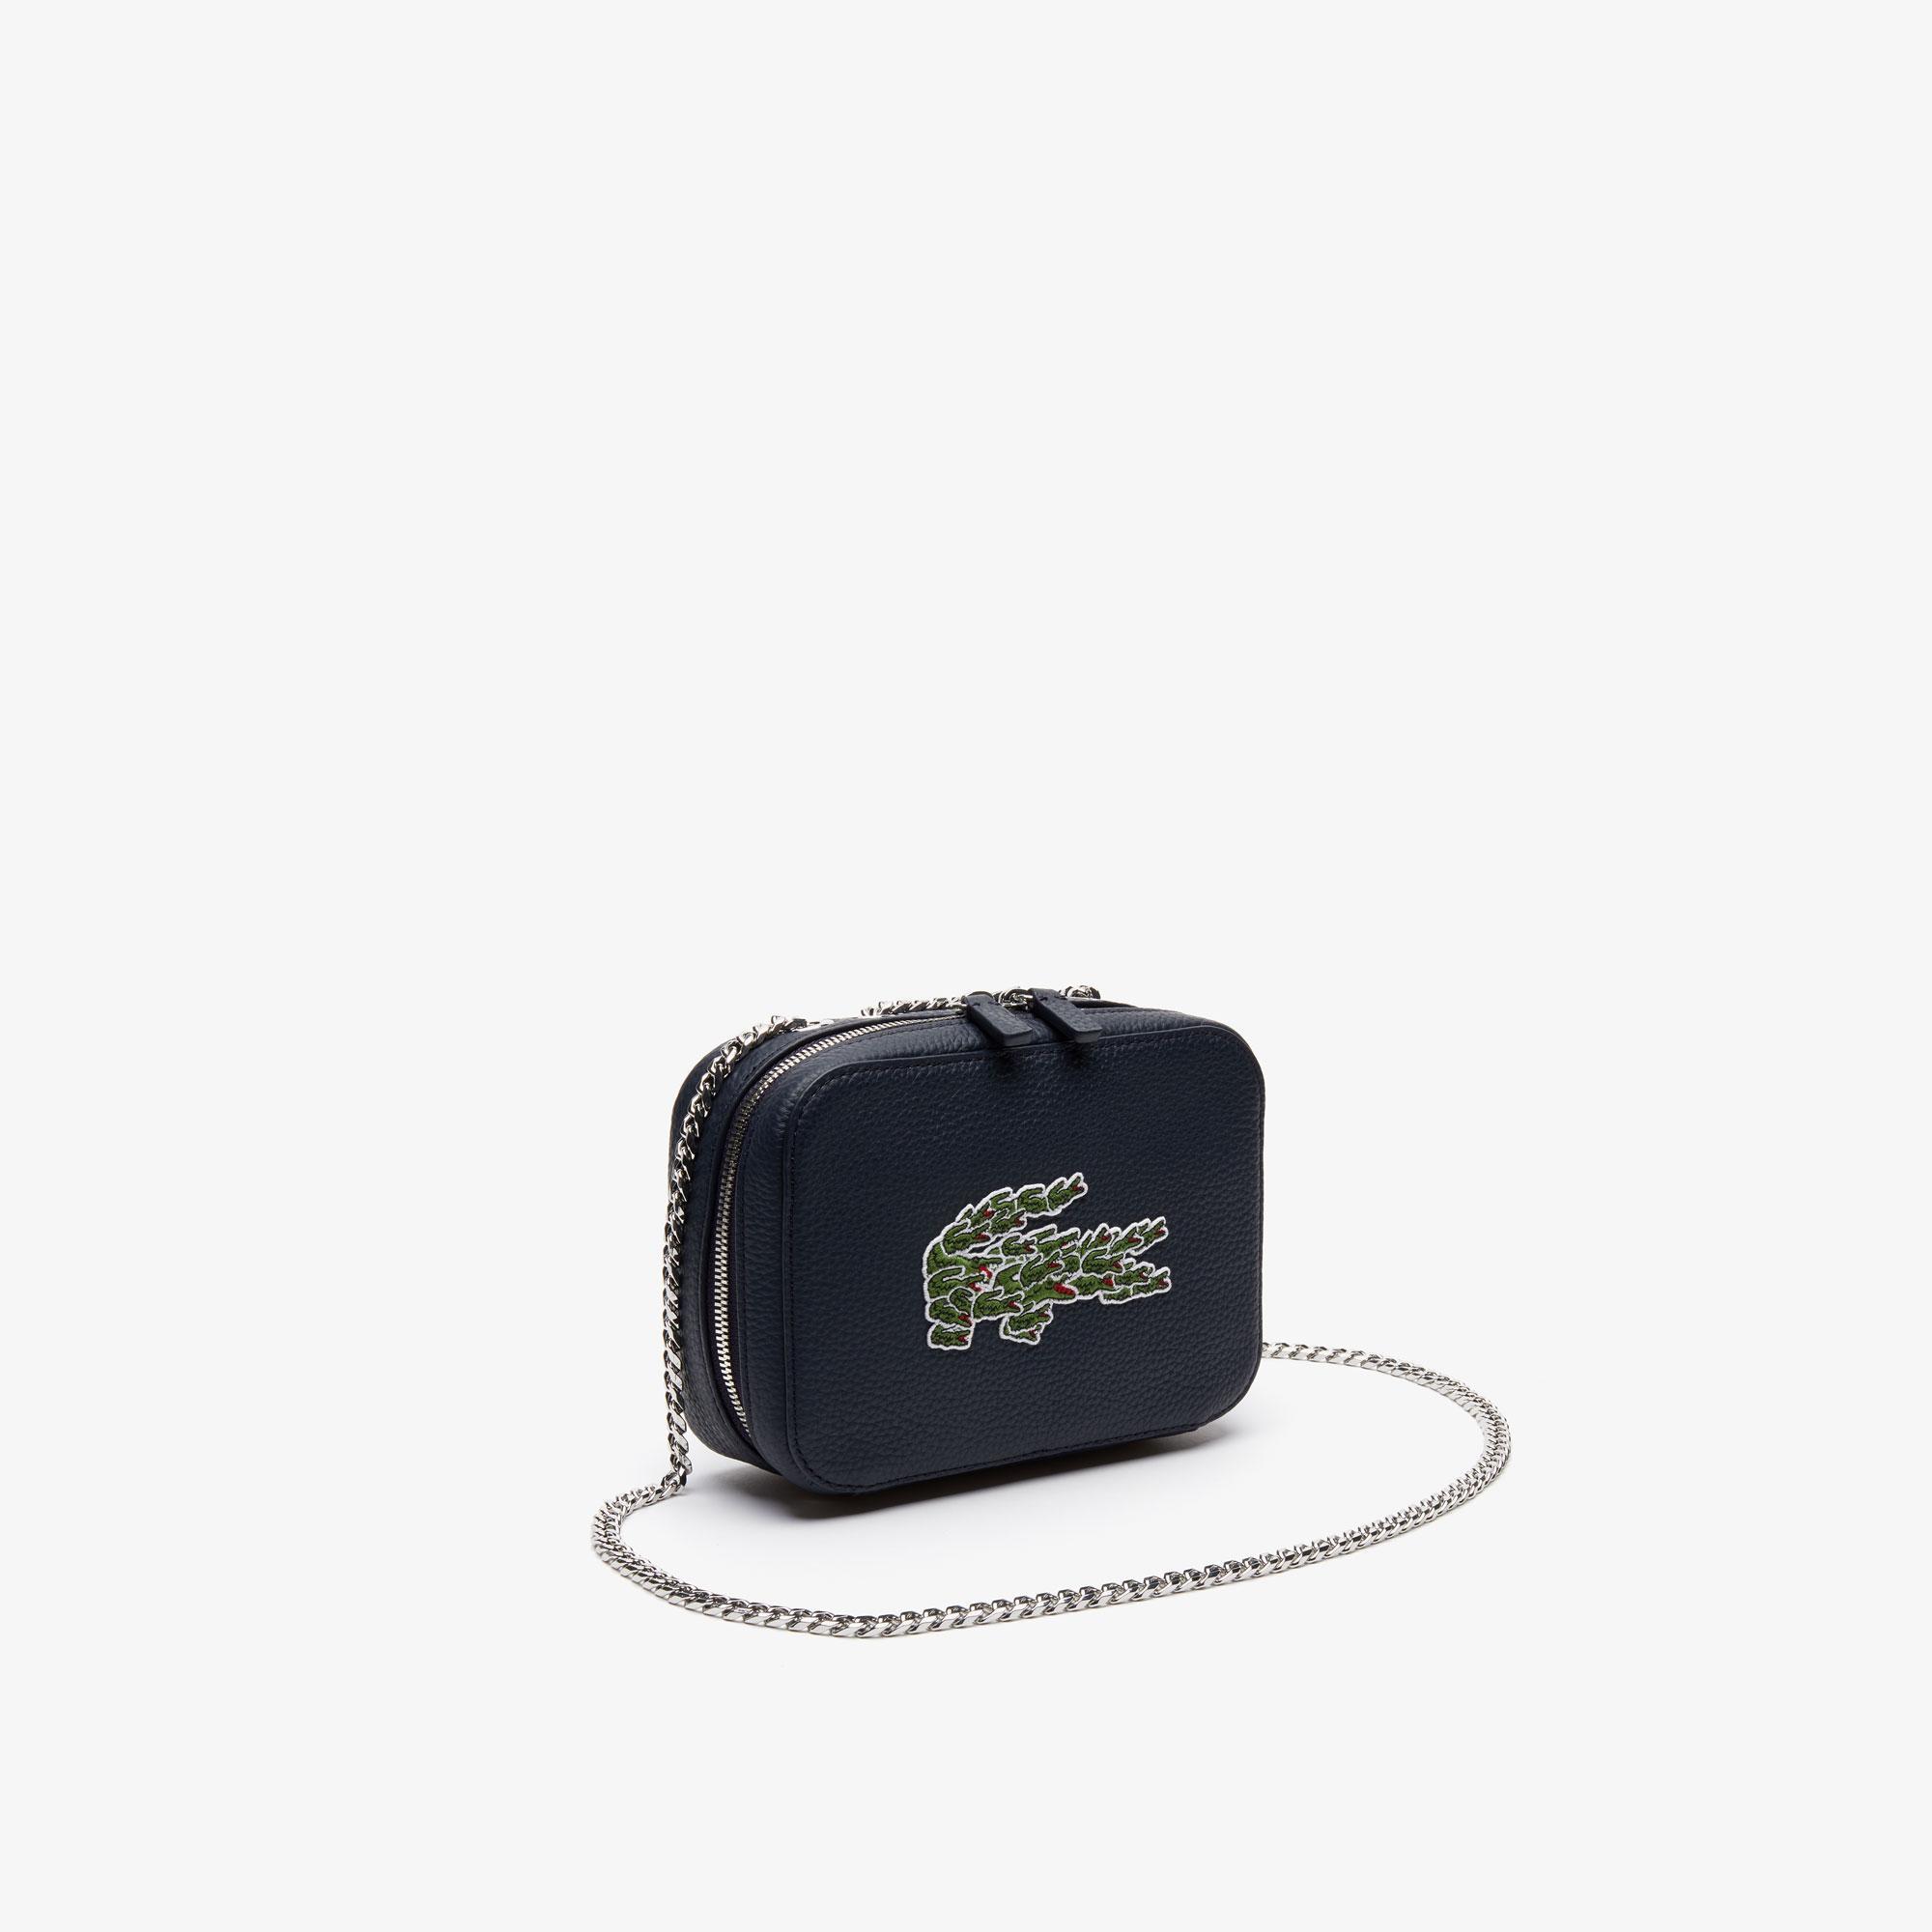 Lacoste Women's Croco Crew Multicroc Grained Leather Shoulder Bag